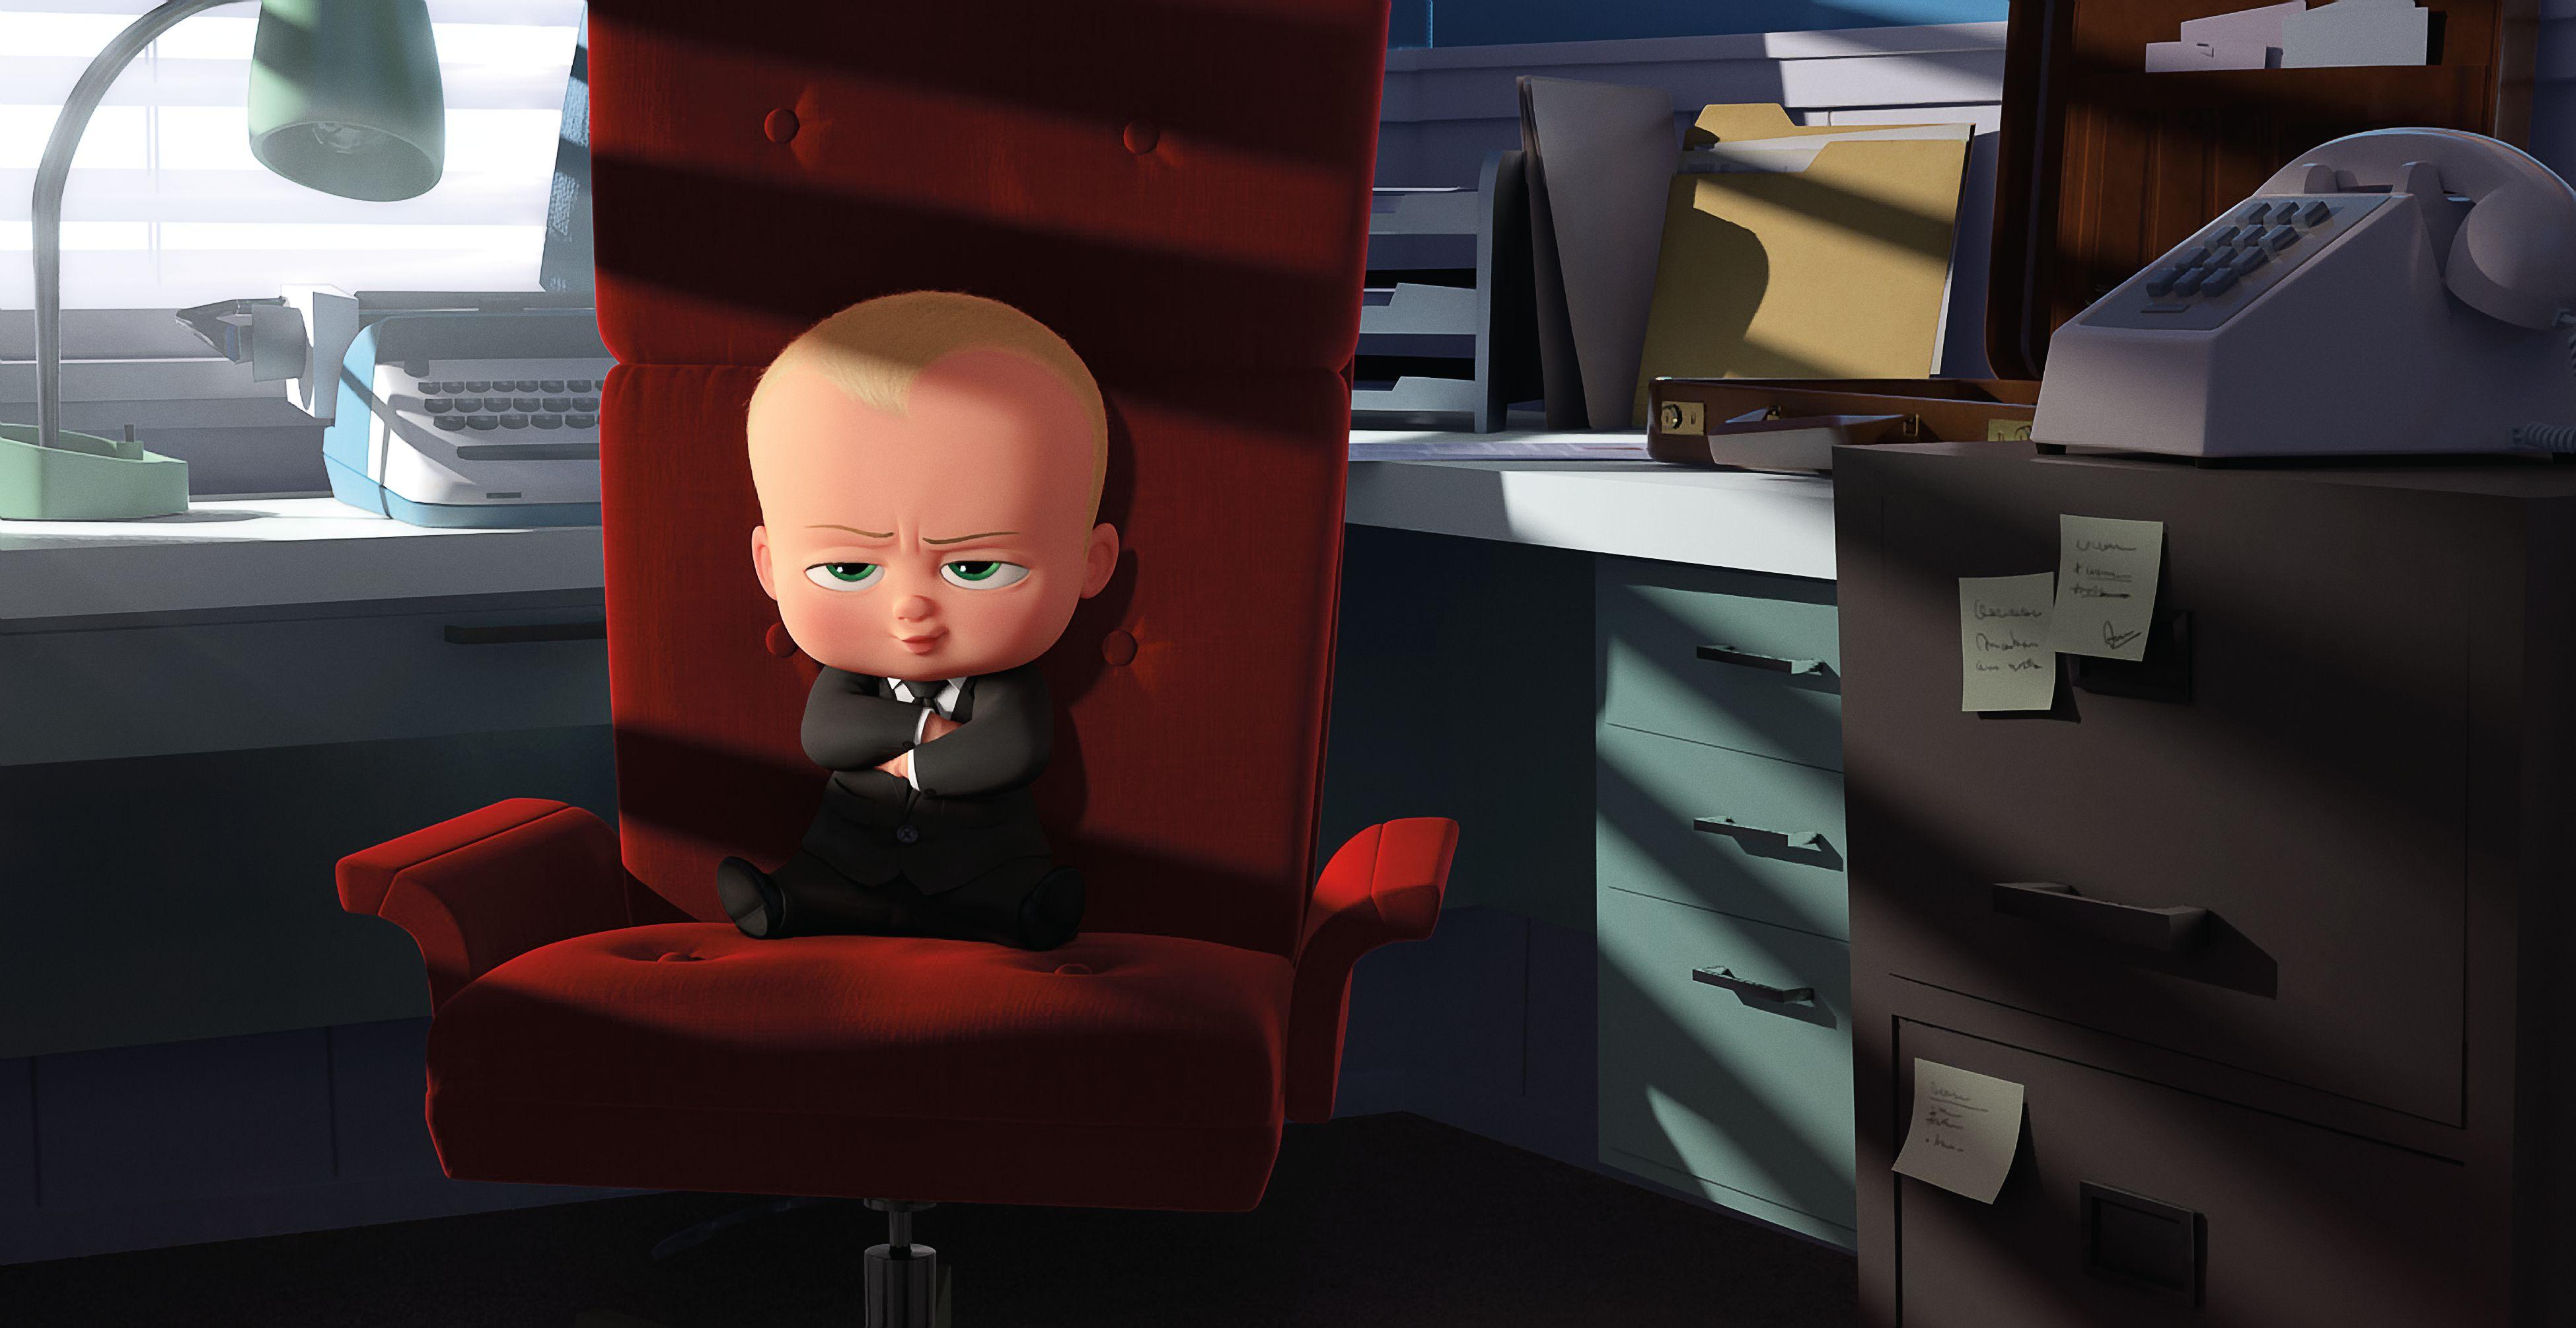 the-boss-baby%e5%8e%9f%e9%a1%8c%e4%bb%ae%e3%83%a1%e3%82%a4%e3%83%b3